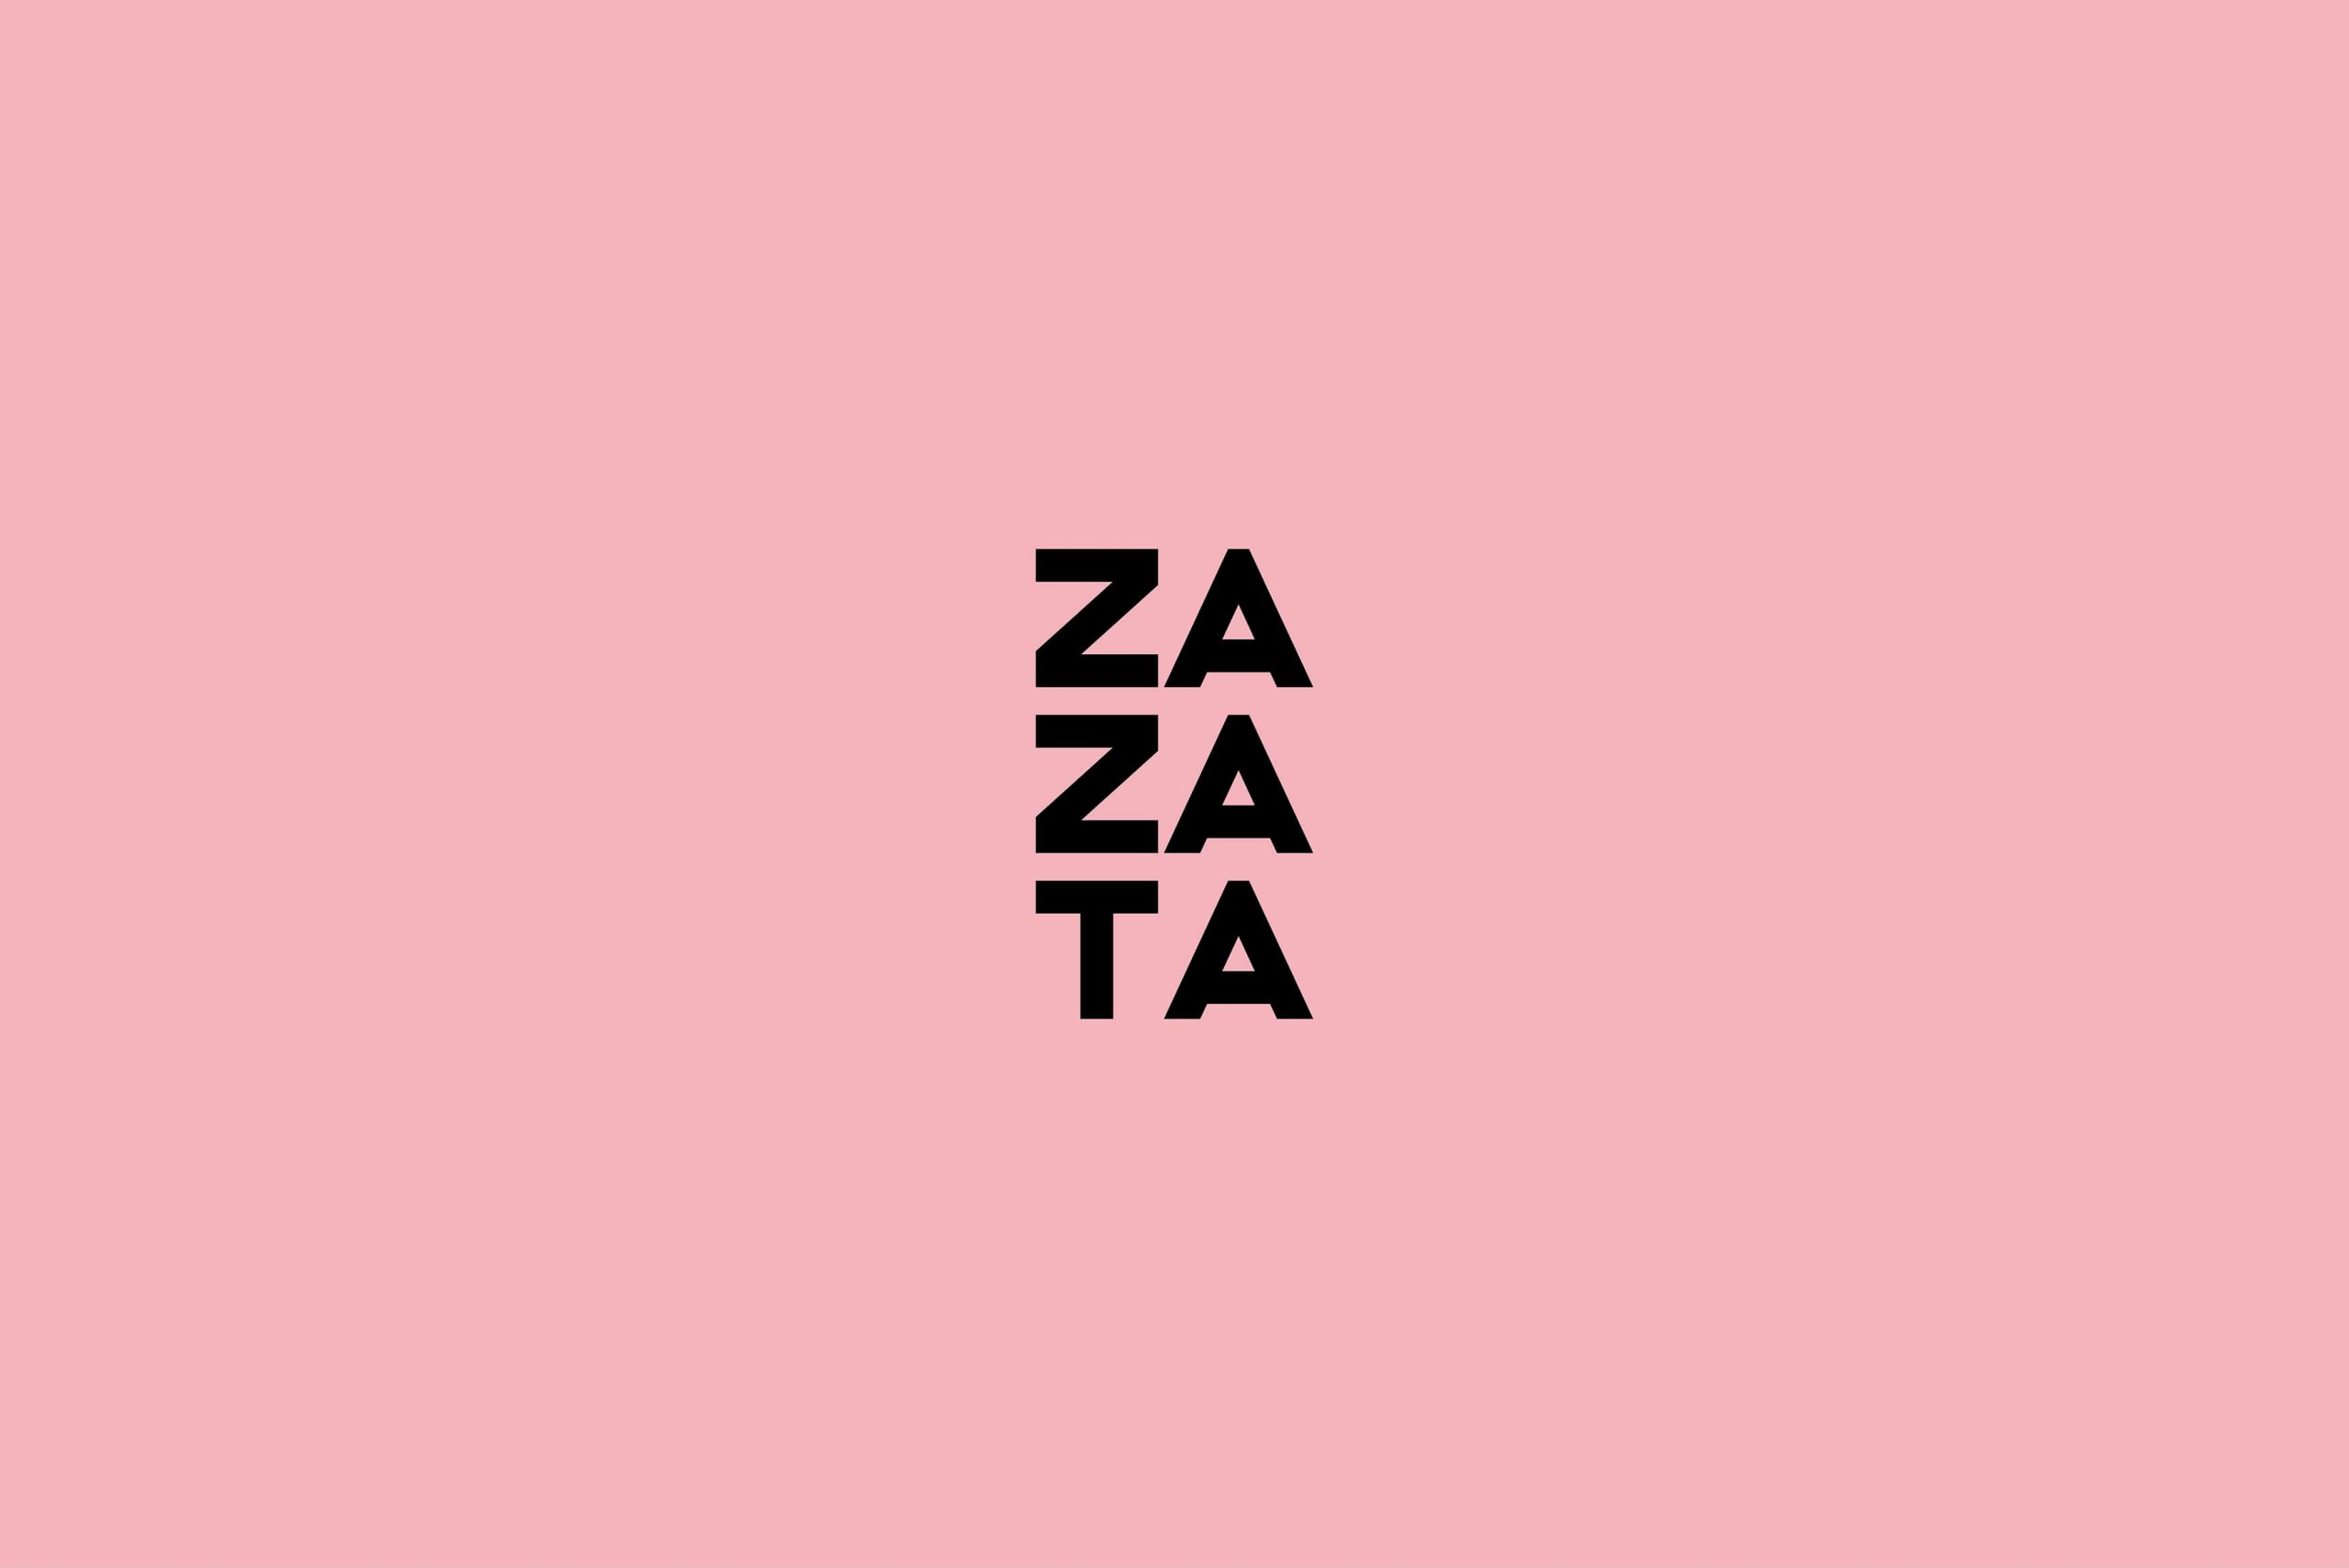 Ovolo Za Za Ta Hospitality Visual Identity - logotype on brand colour background